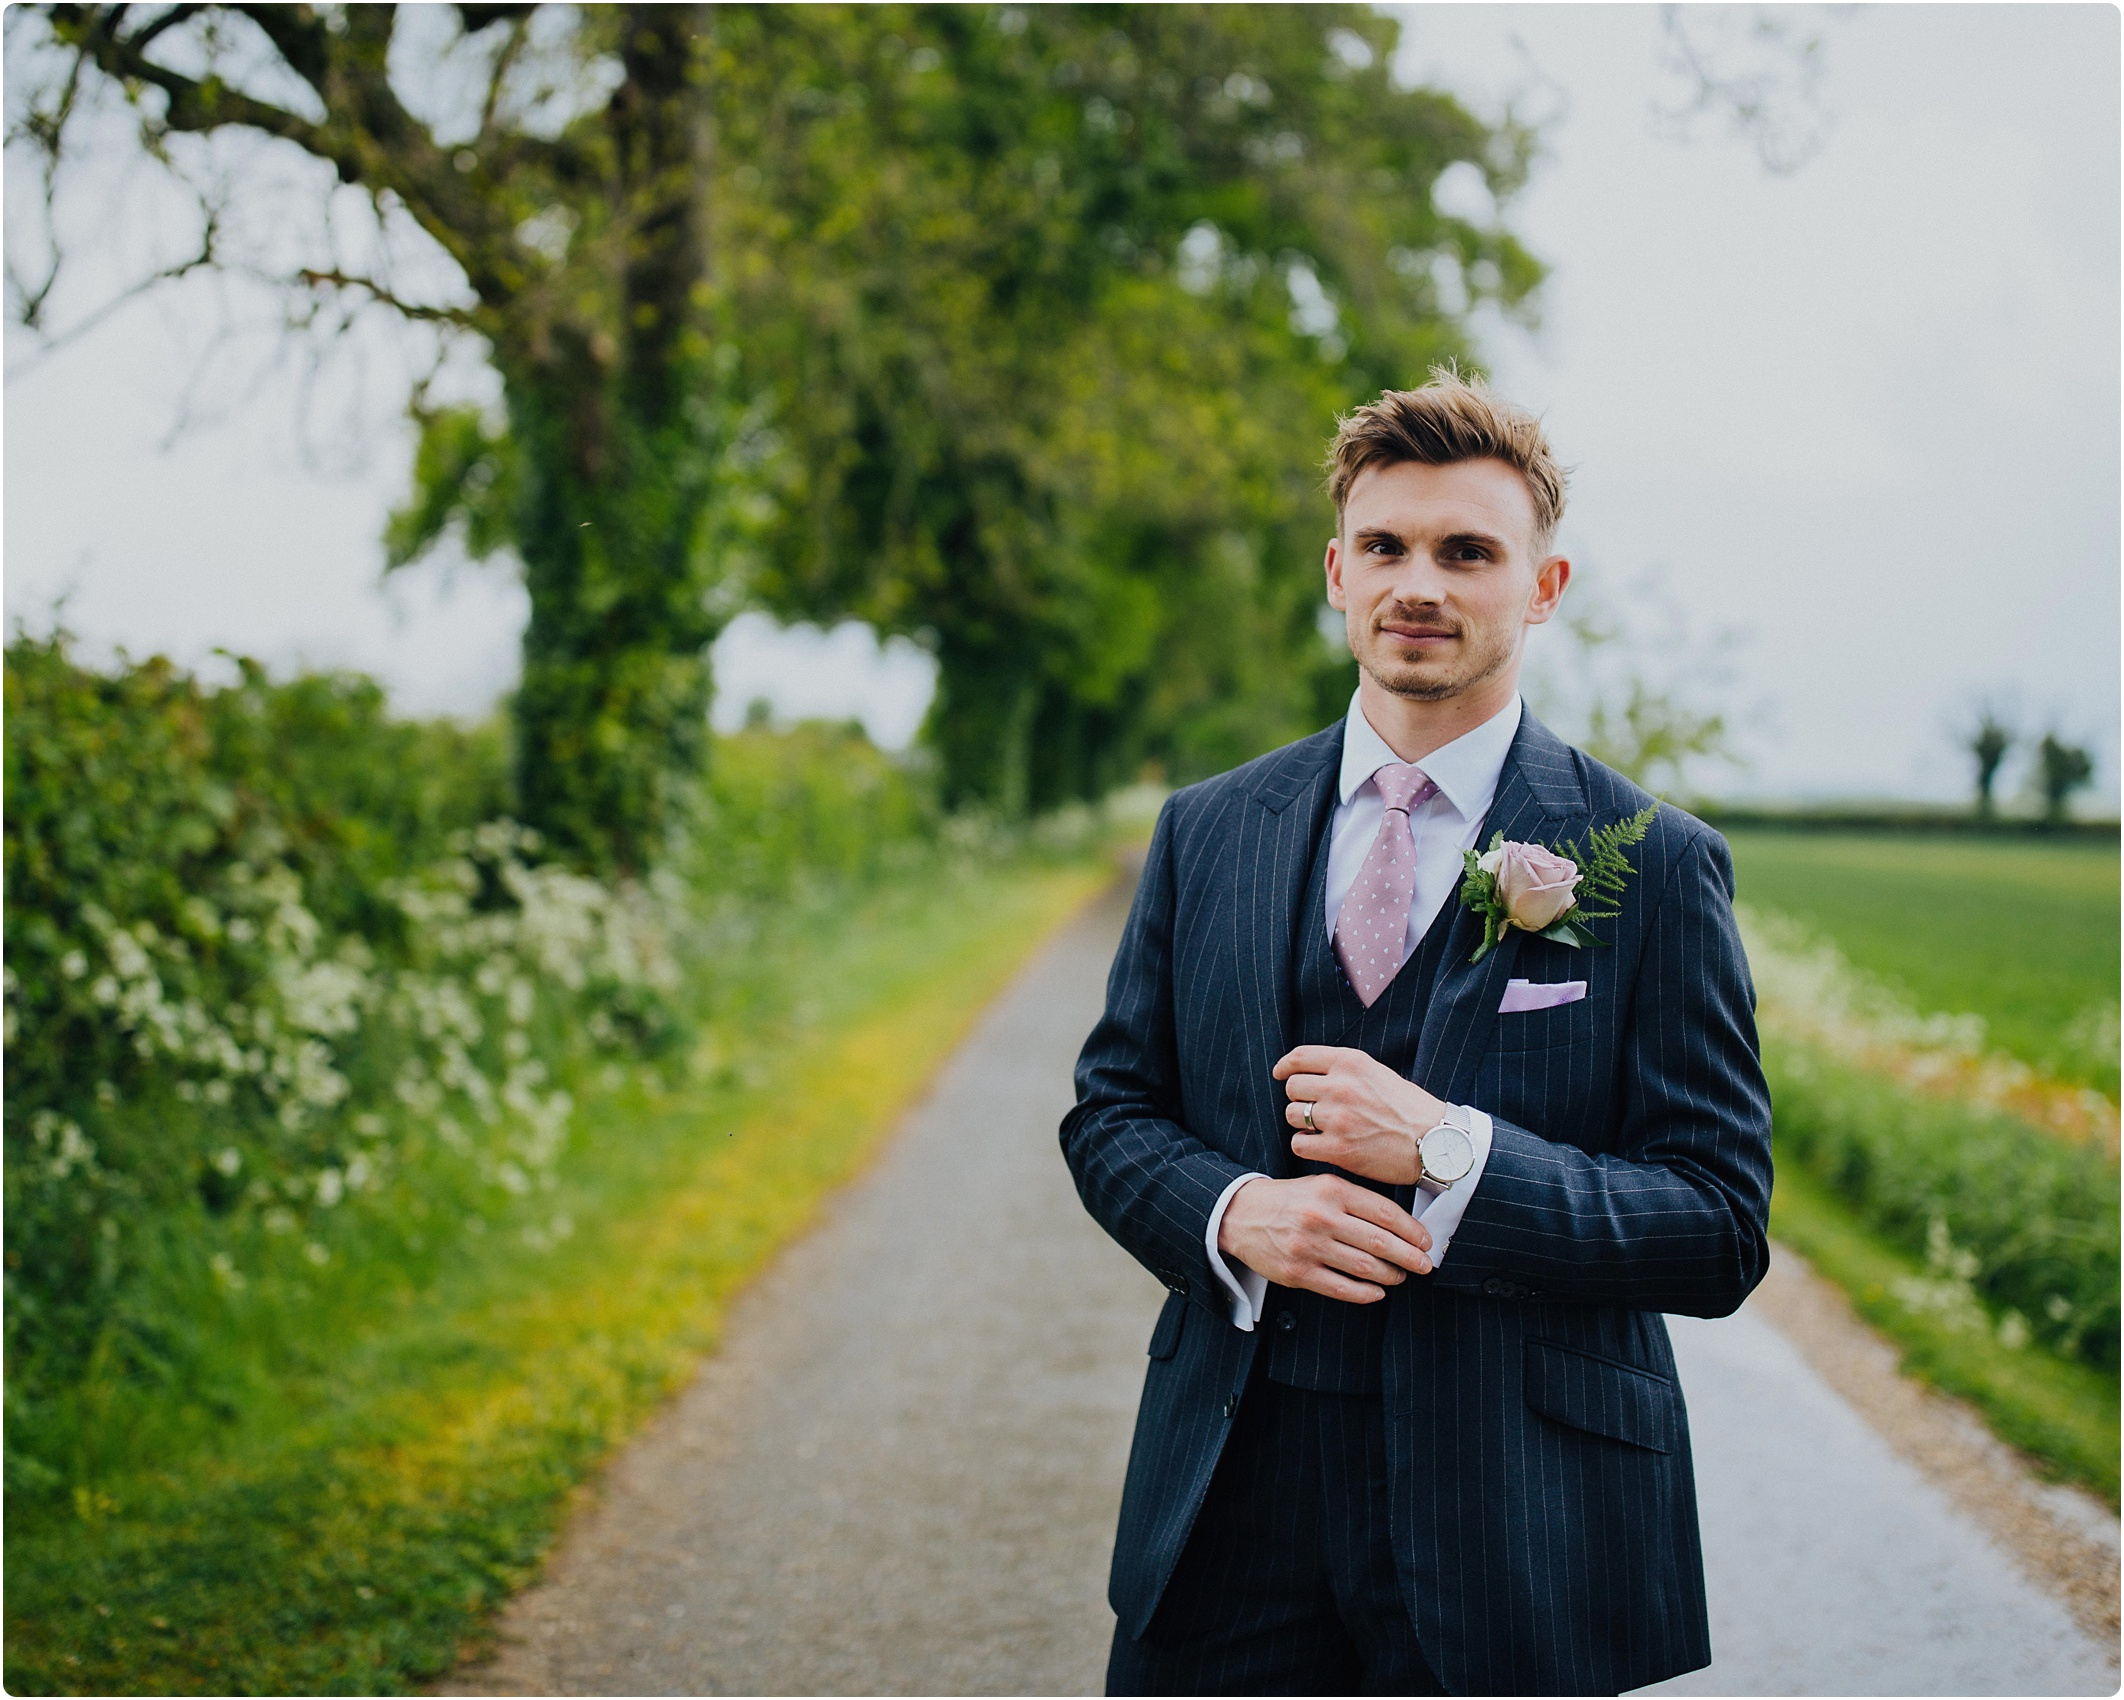 suit supply pinstripe suit